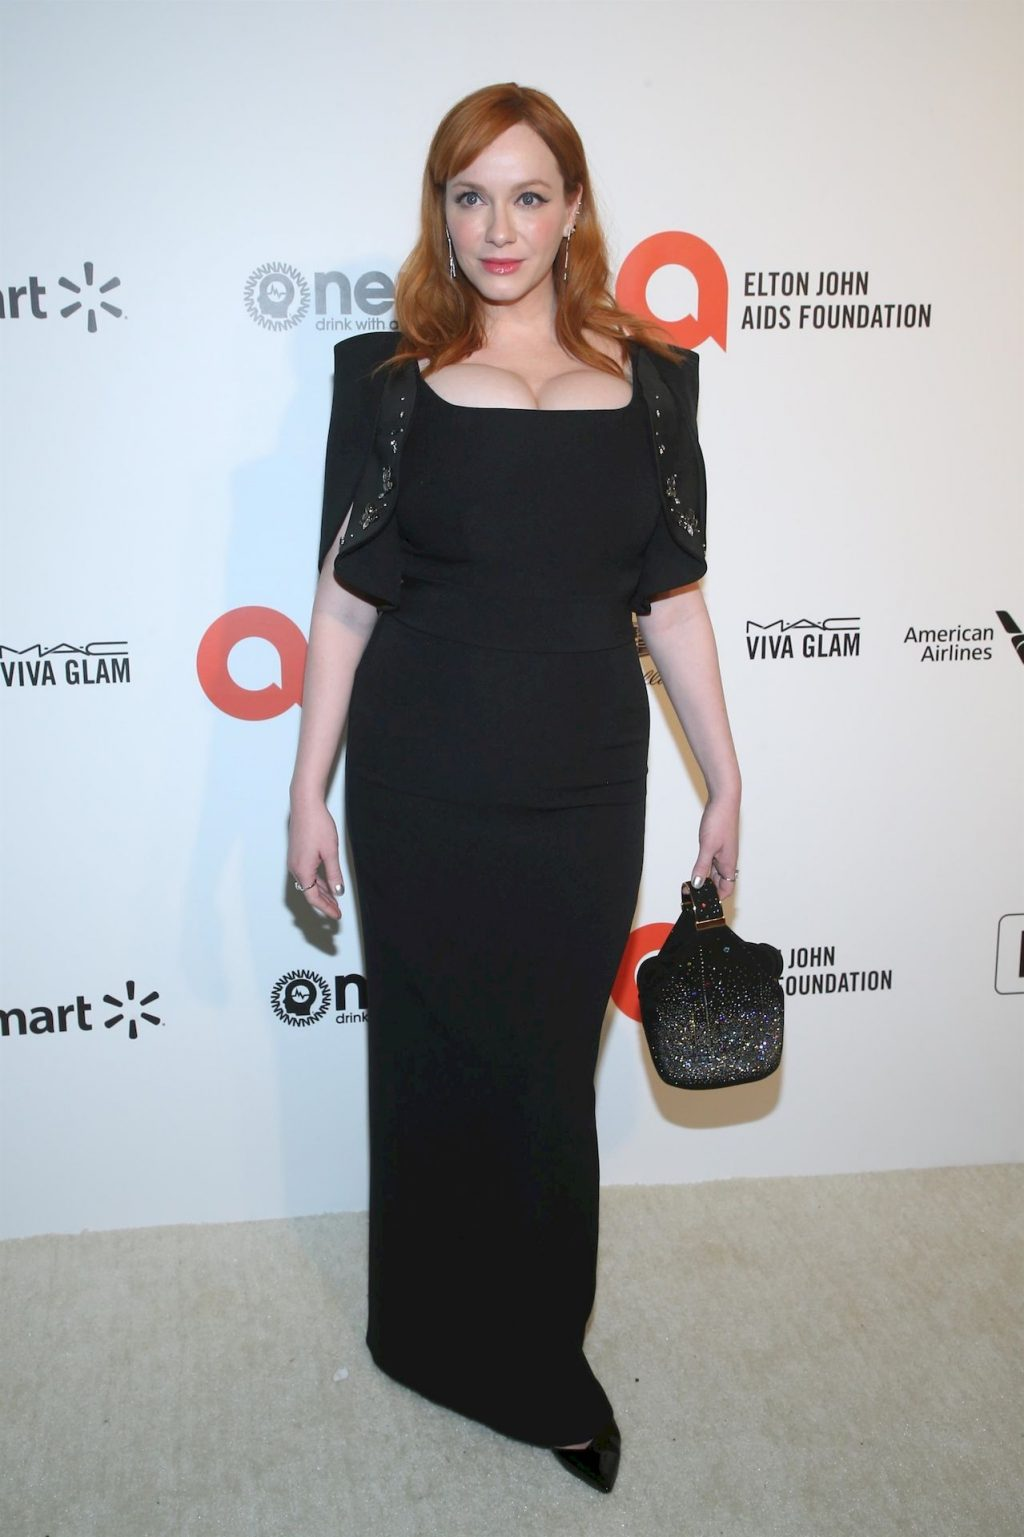 Christina Hendricks Shows Off Her Big Boobs at the 28th Annual Elton John Oscar Viewing Party (14 Photos)